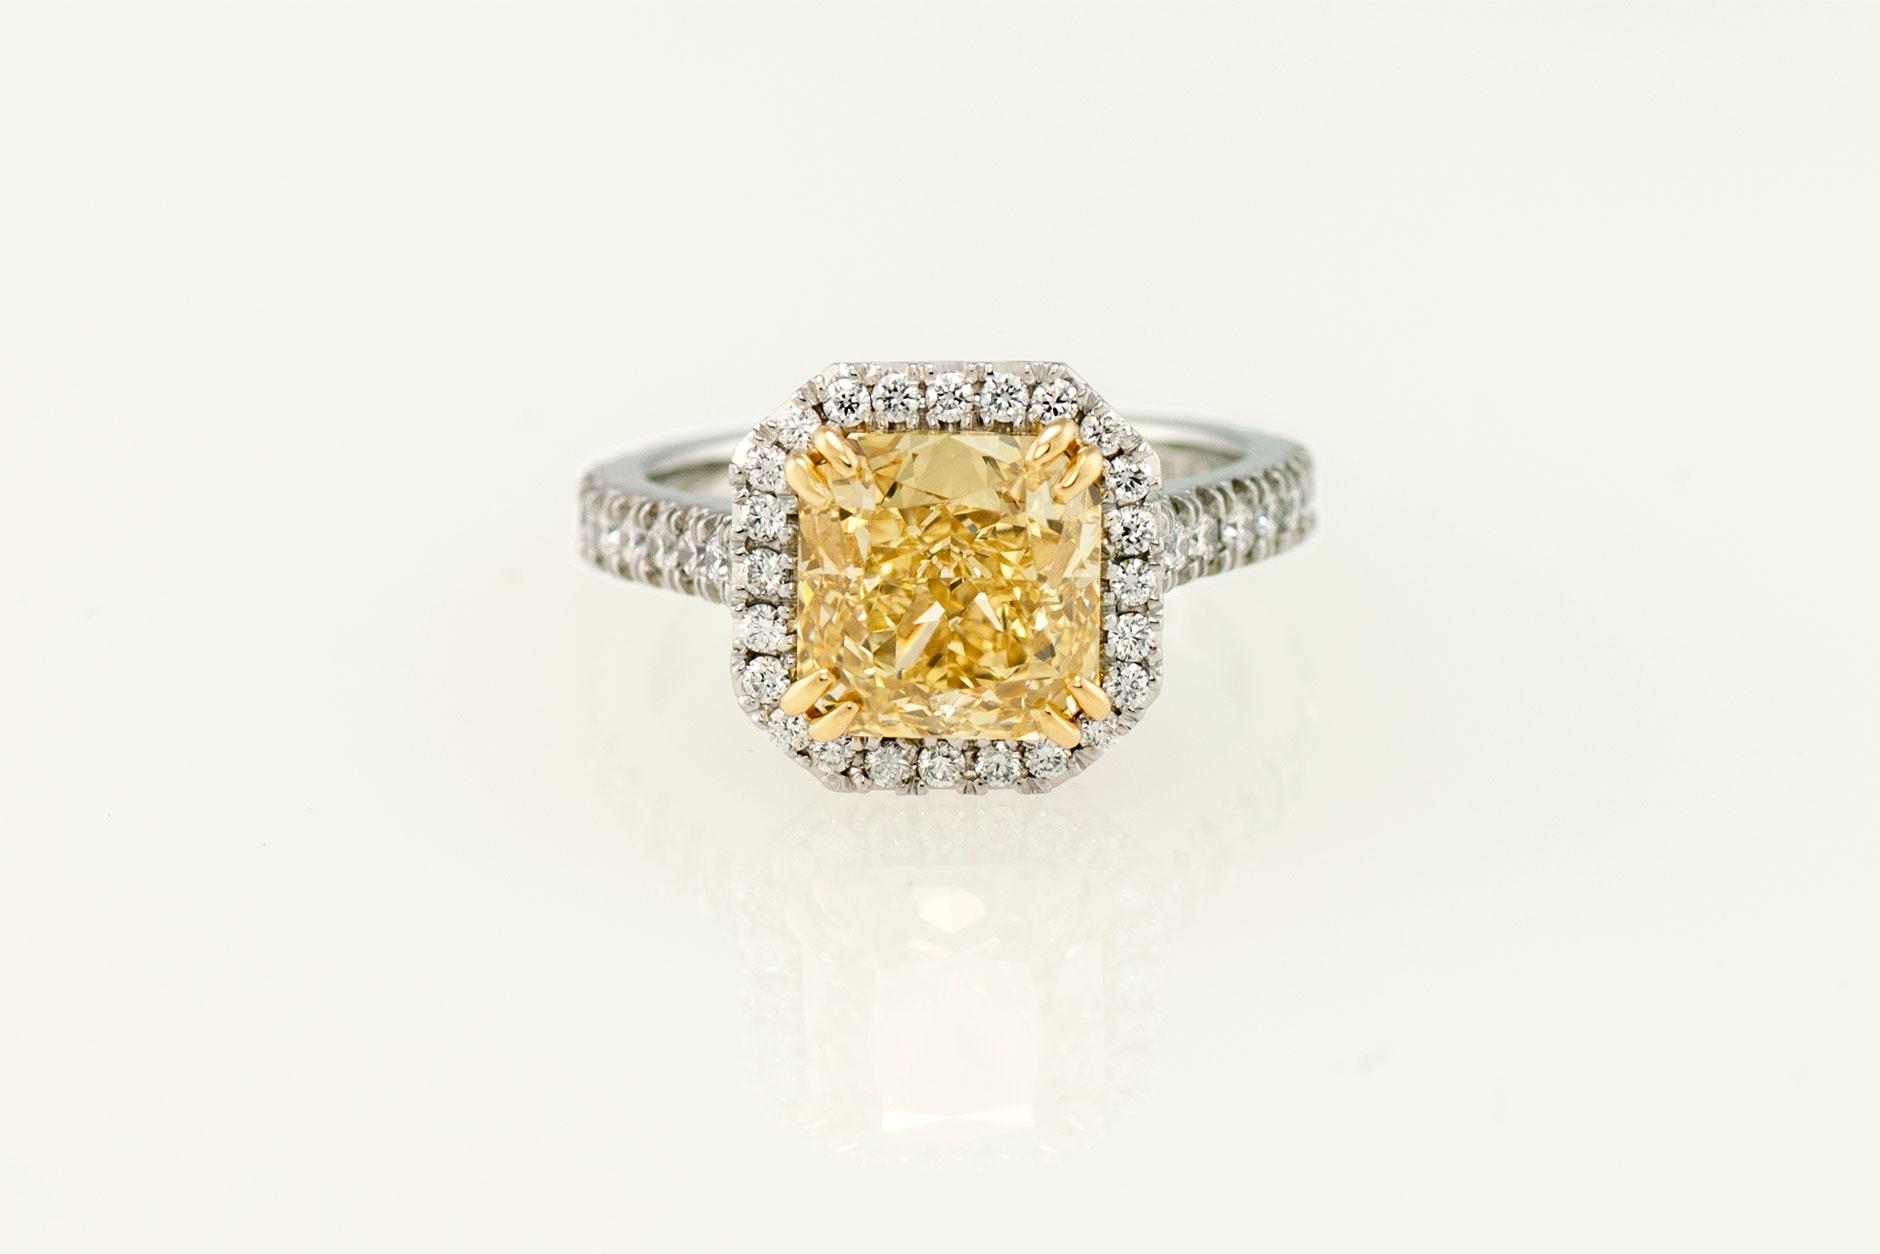 Custom 3 ct 19k Gold Radiant Cut Yellow Diamond Halo Ring - NEWA Goldsmith